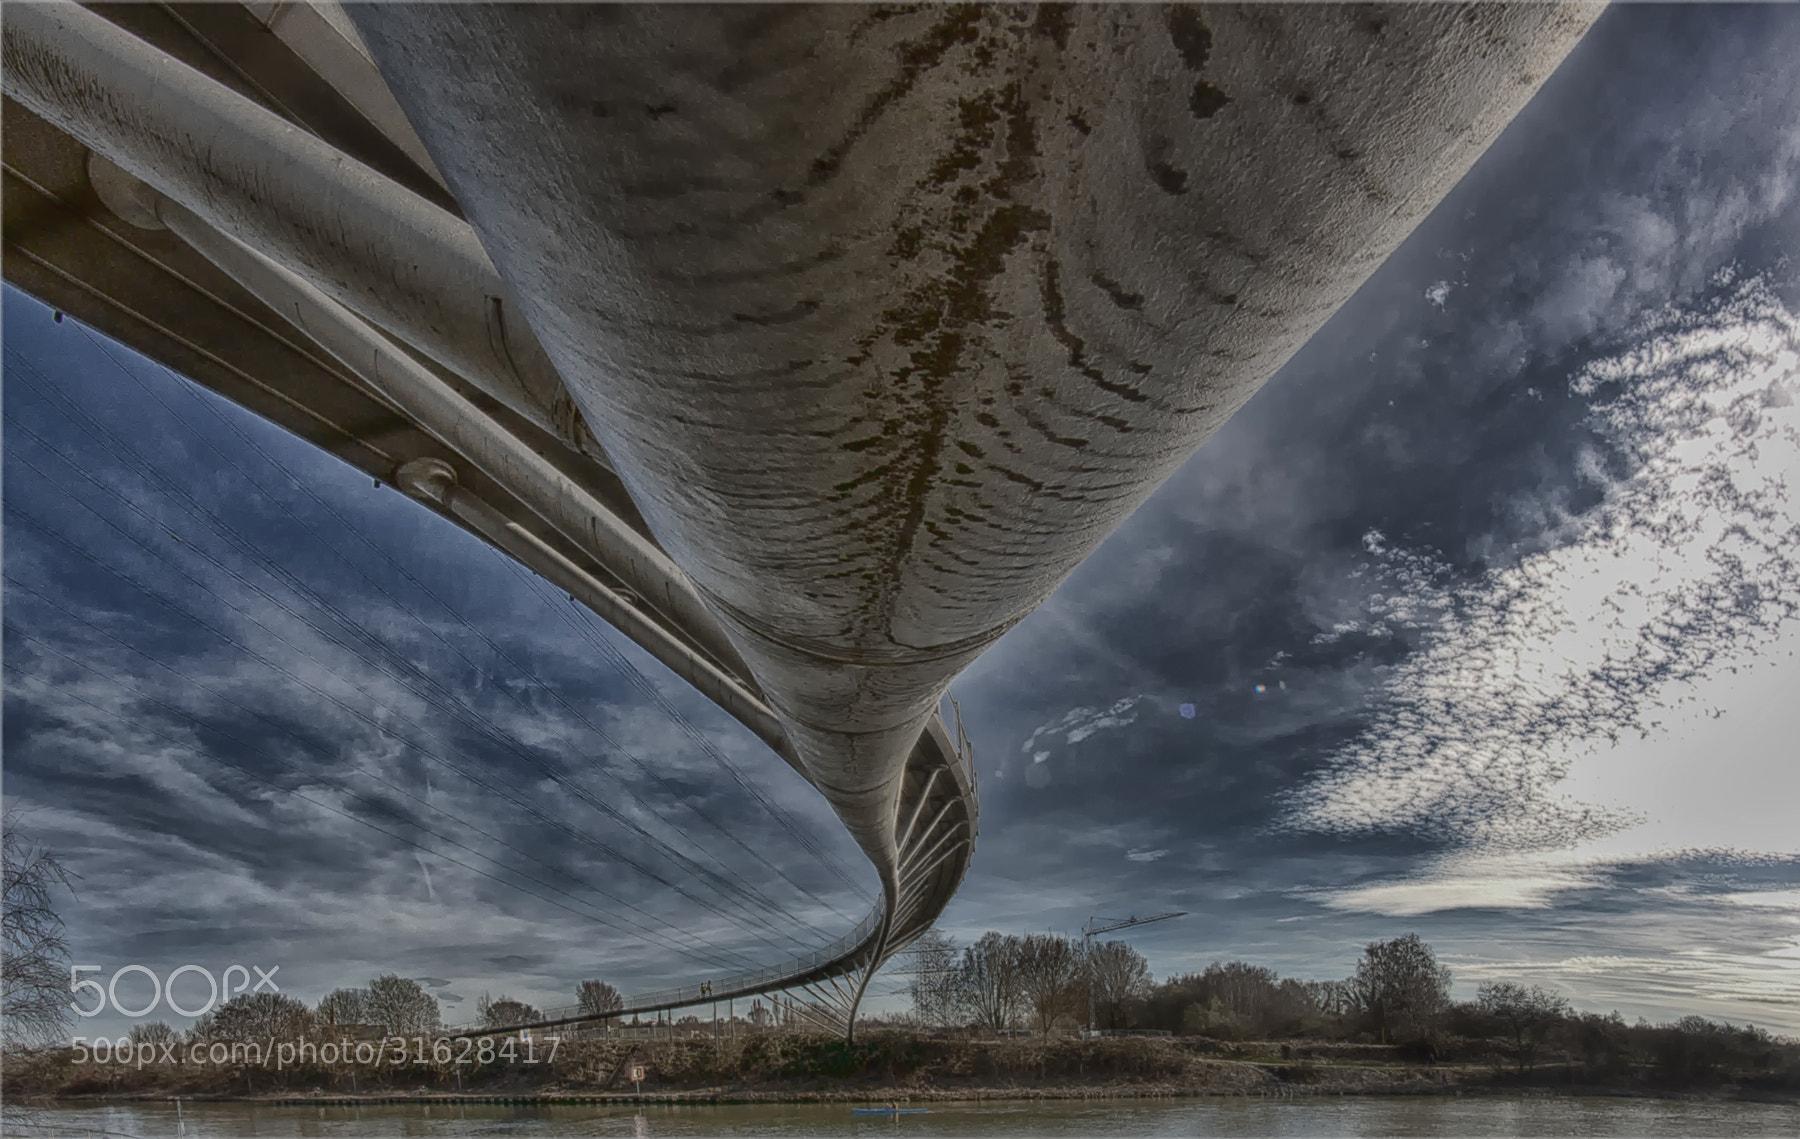 Photograph Brücke by jan kitel on 500px